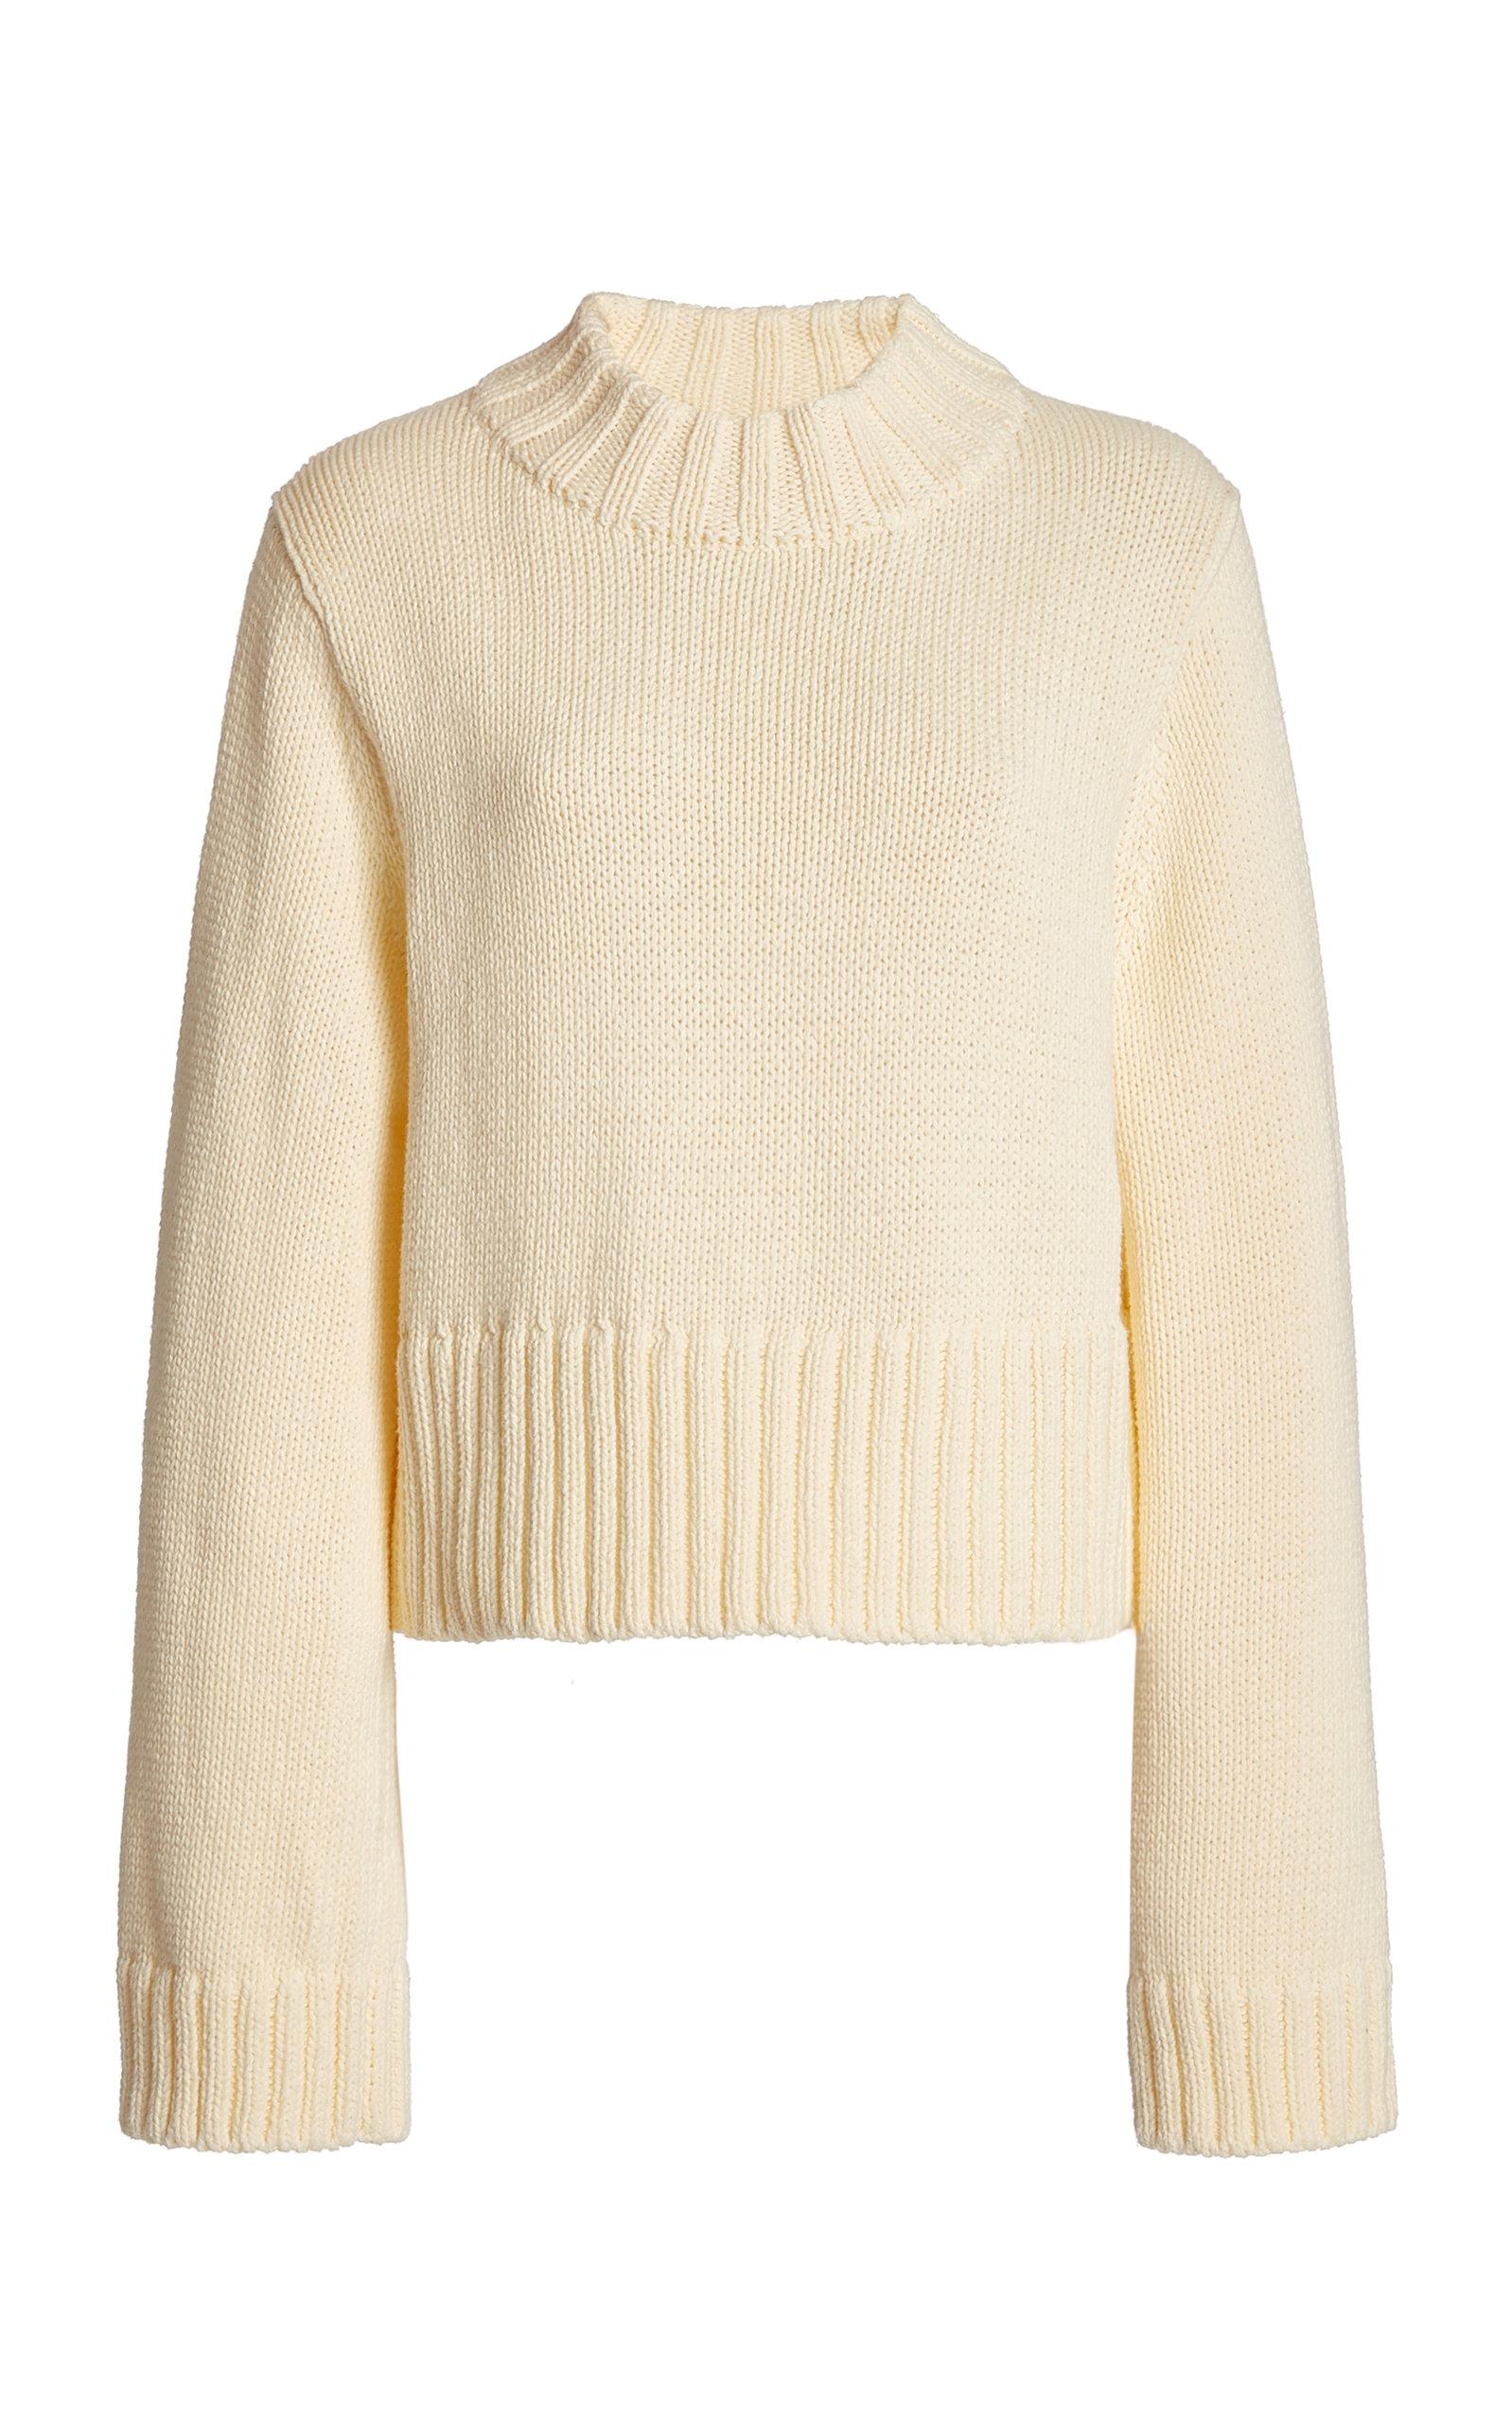 Women's Verona Cotton Mock-Neck Sweater